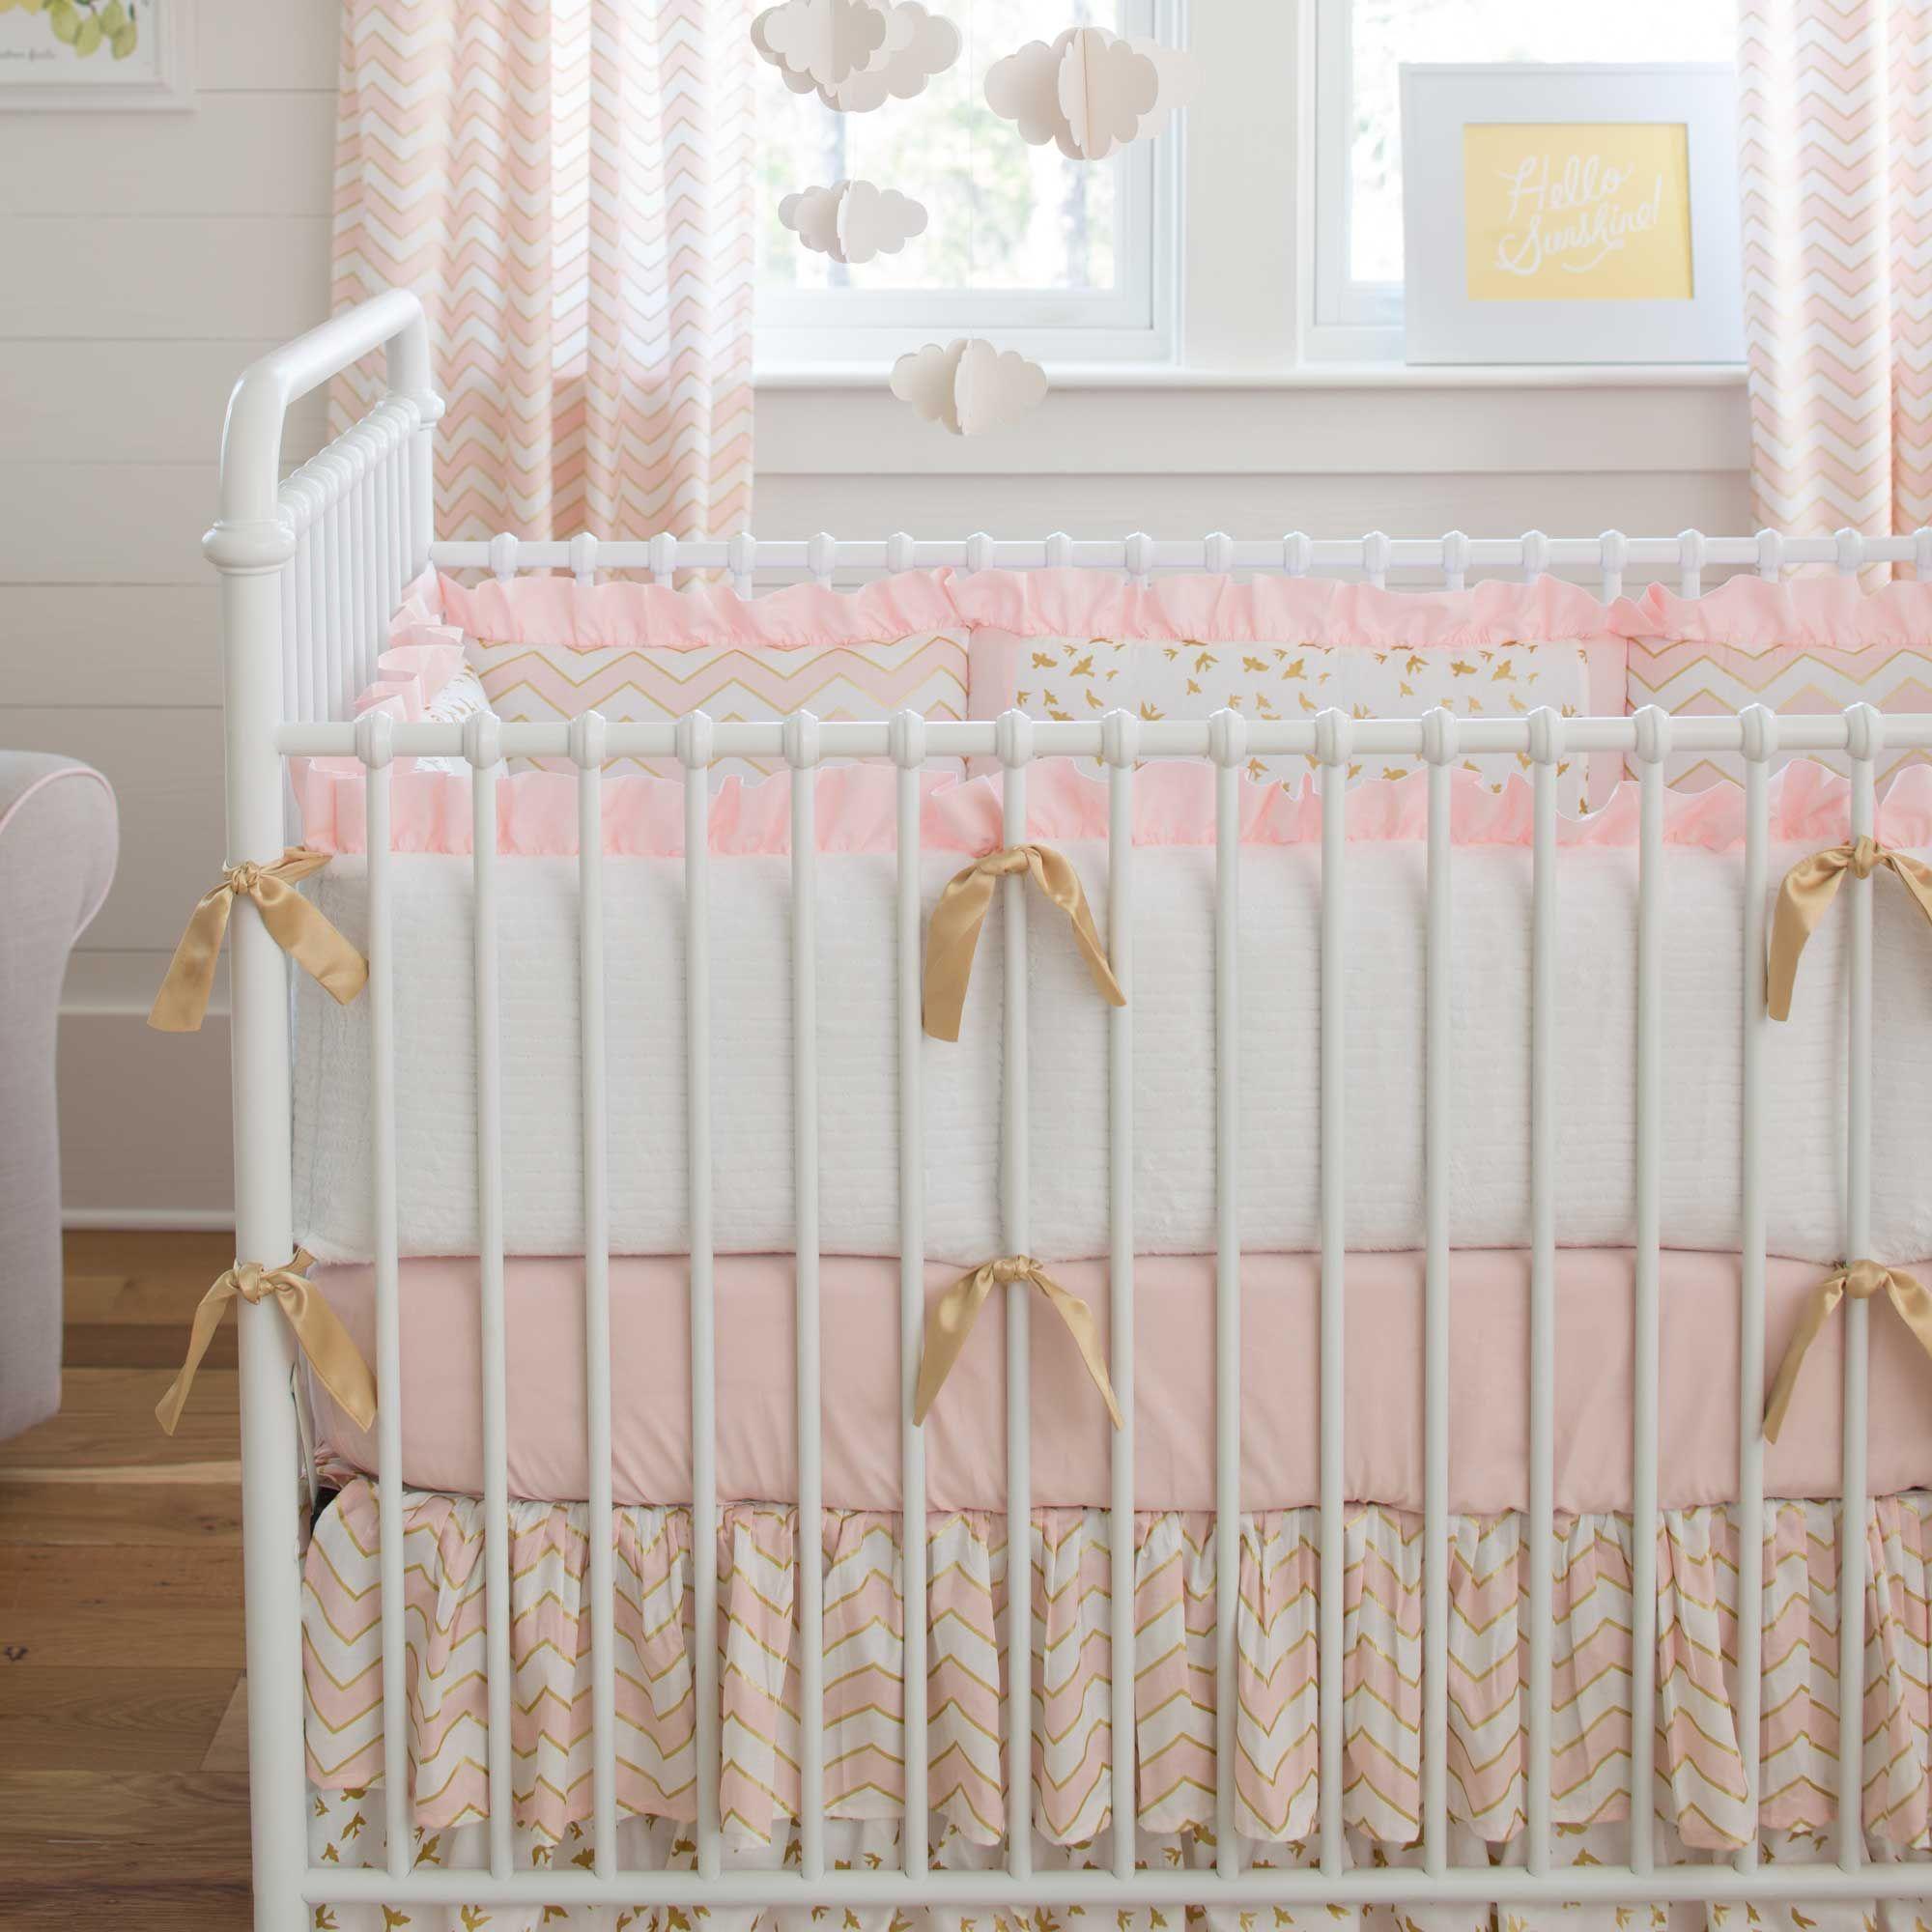 Pale Pink and Gold Chevron Crib Bumper Carousel designs Pale